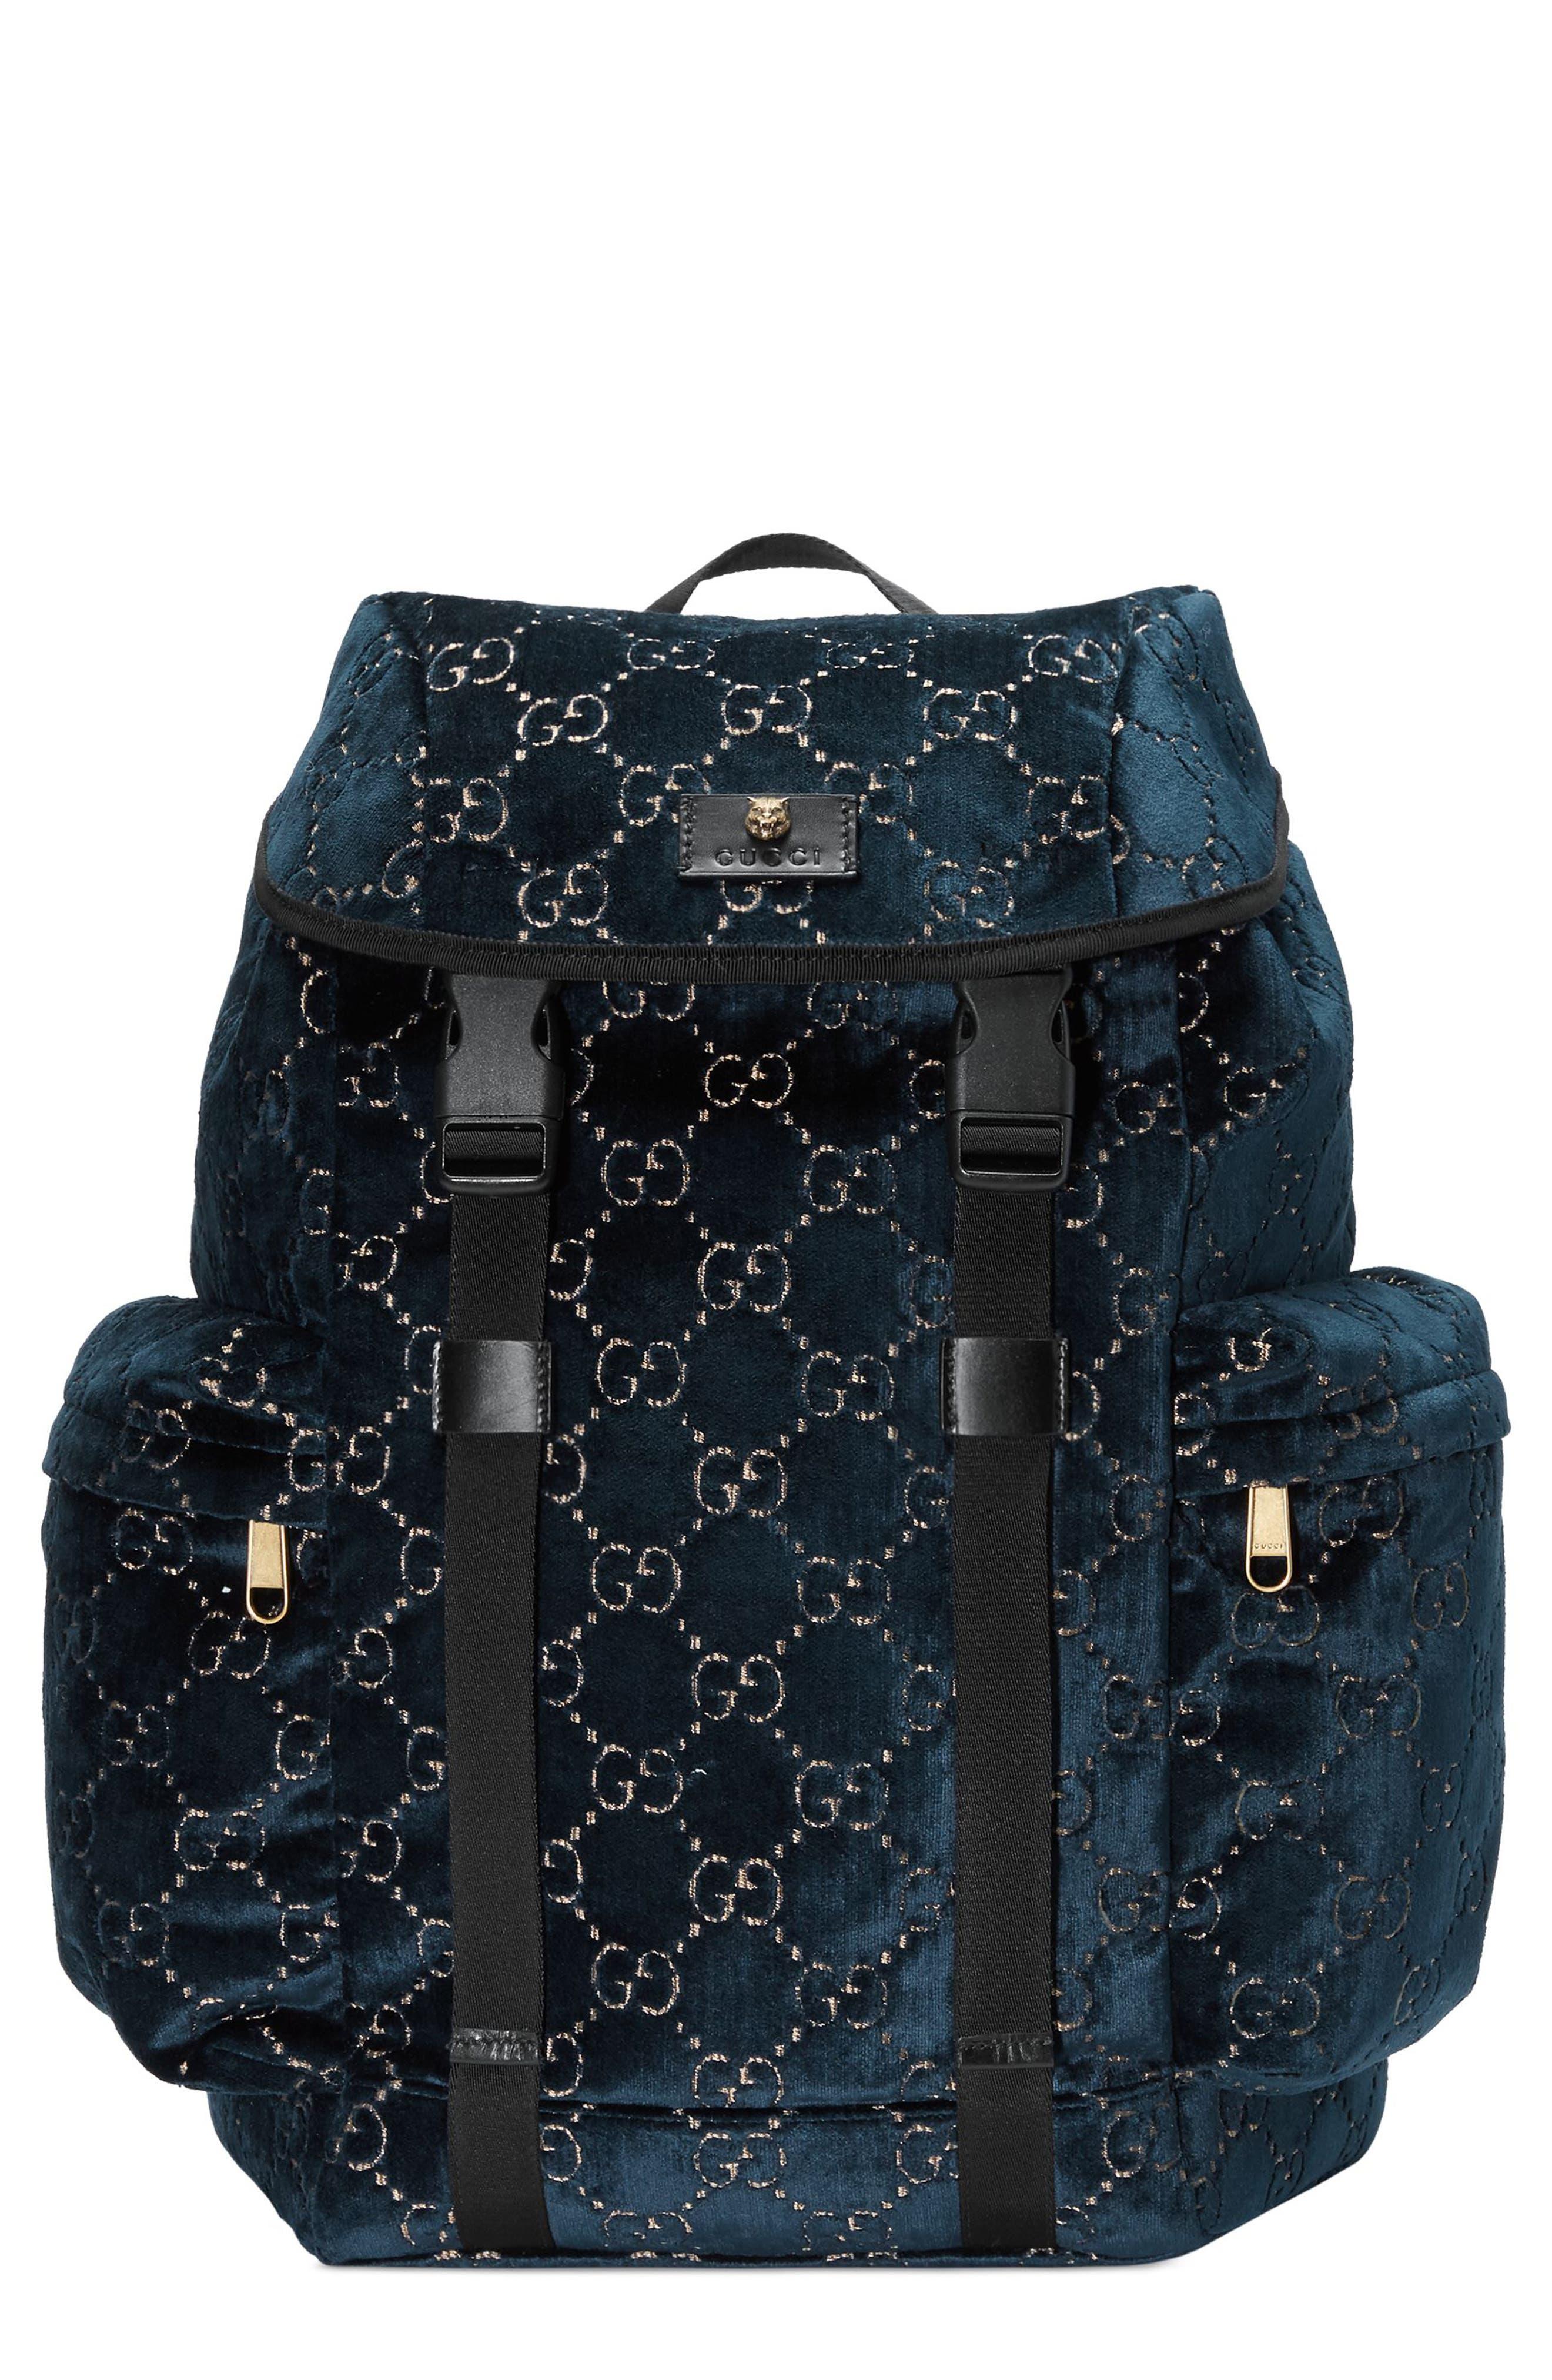 d2521fff204c gucci backpack | Nordstrom